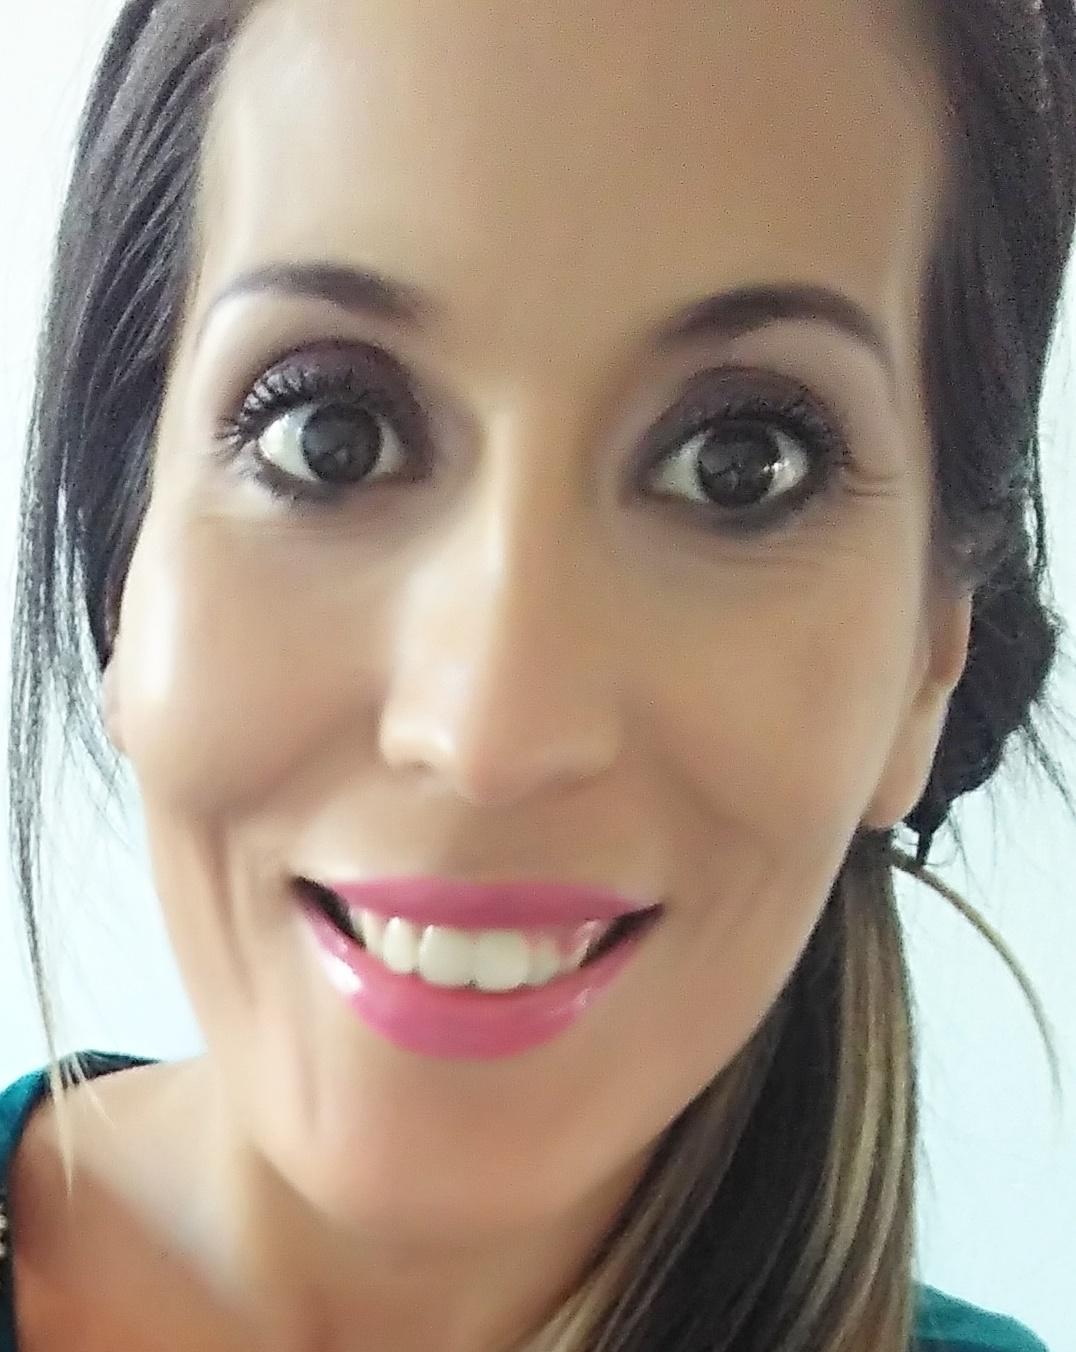 Dra. Mariela Alejandra Repossini